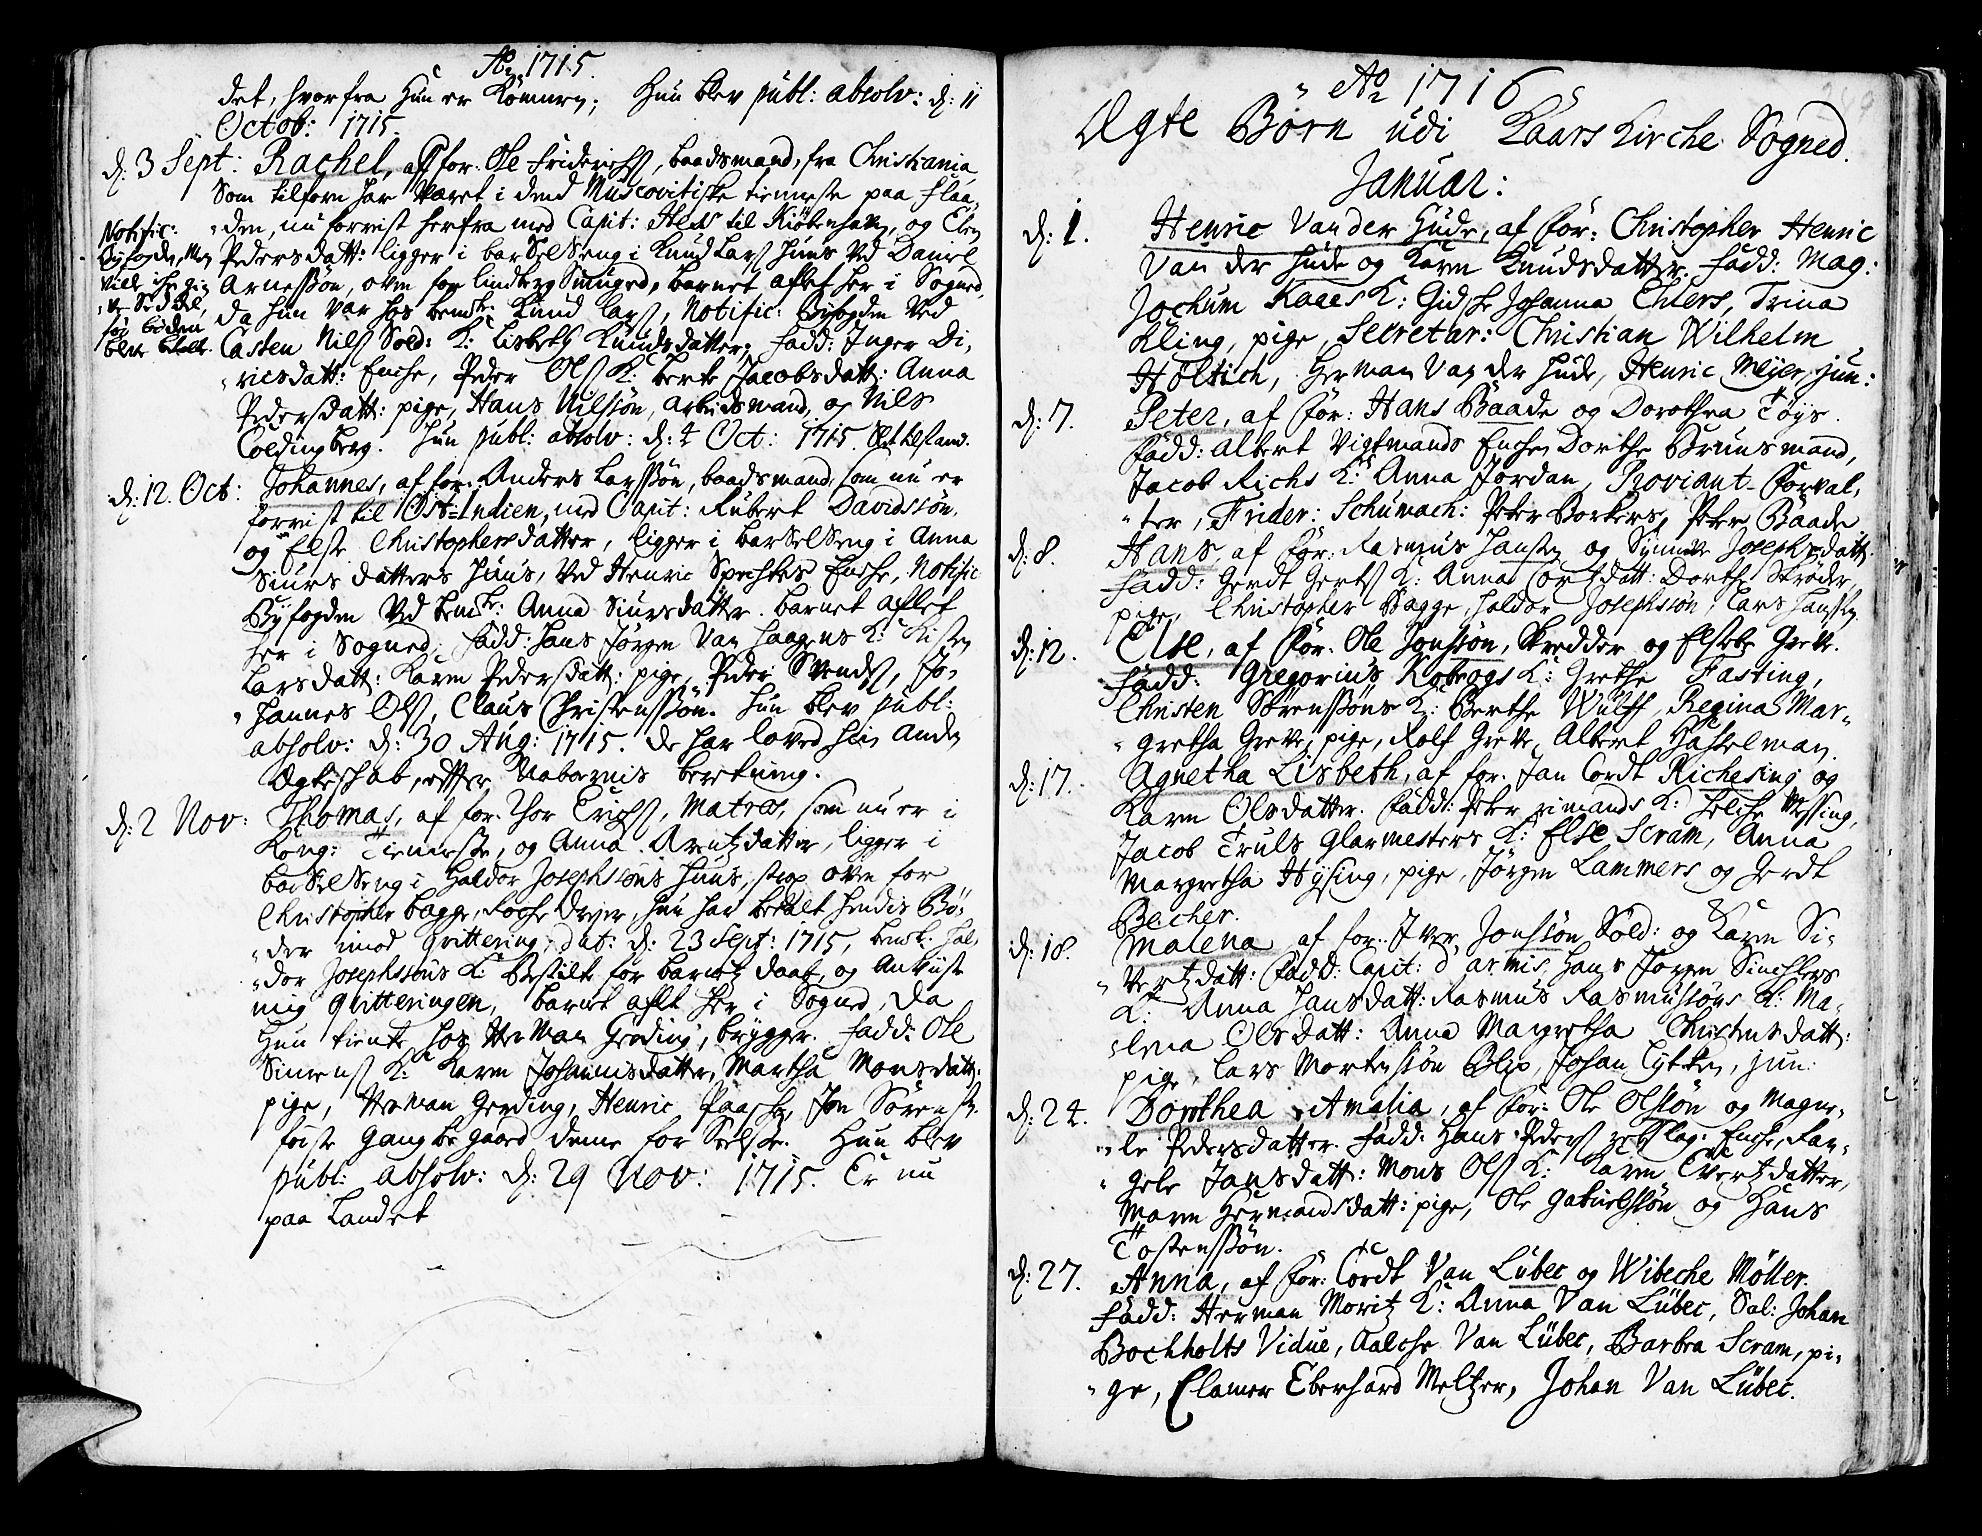 SAB, Korskirken Sokneprestembete, H/Haa/L0003: Ministerialbok nr. A 3, 1698-1719, s. 249